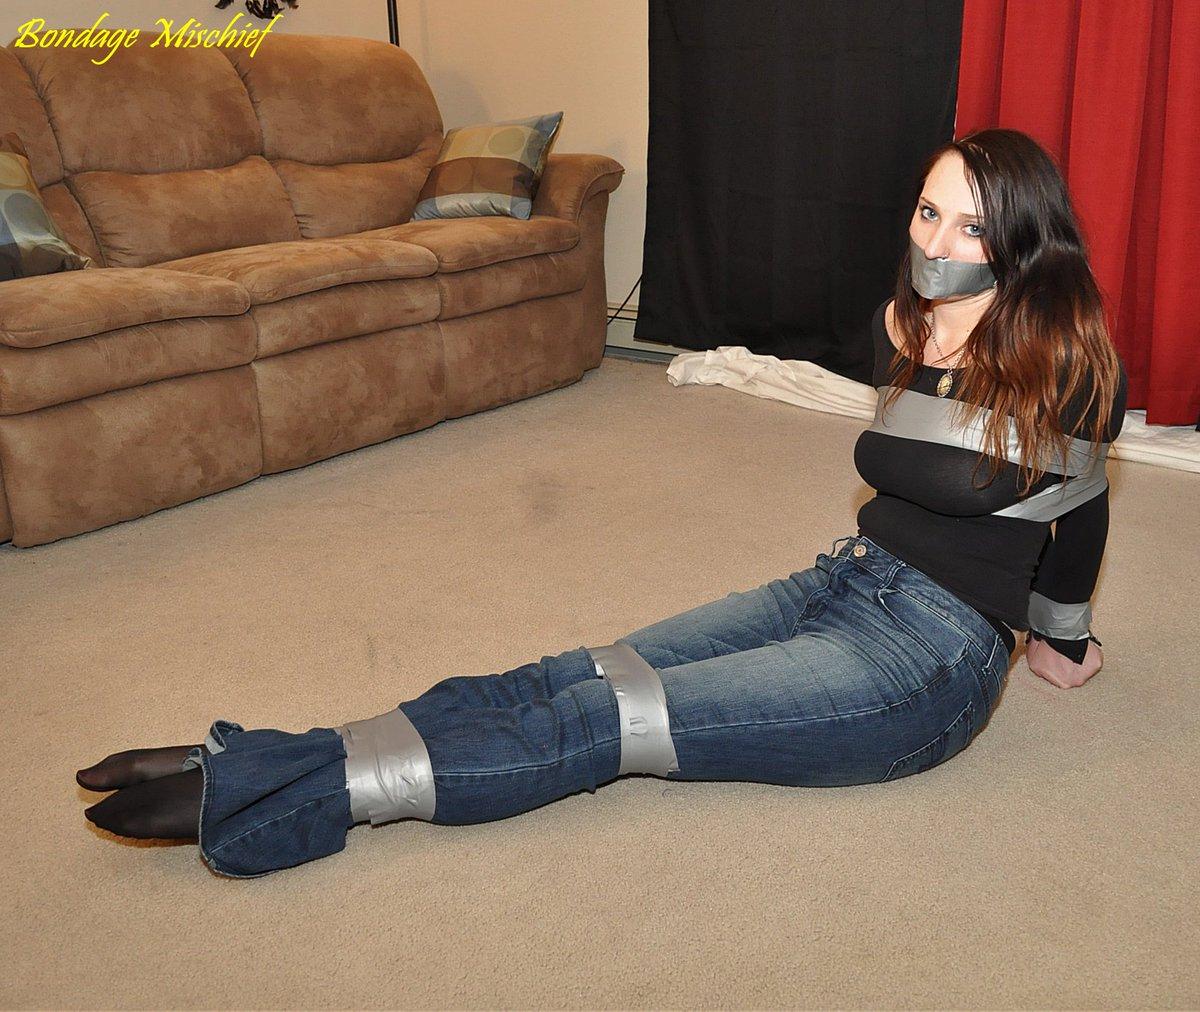 Sarah blake bondage vibrator